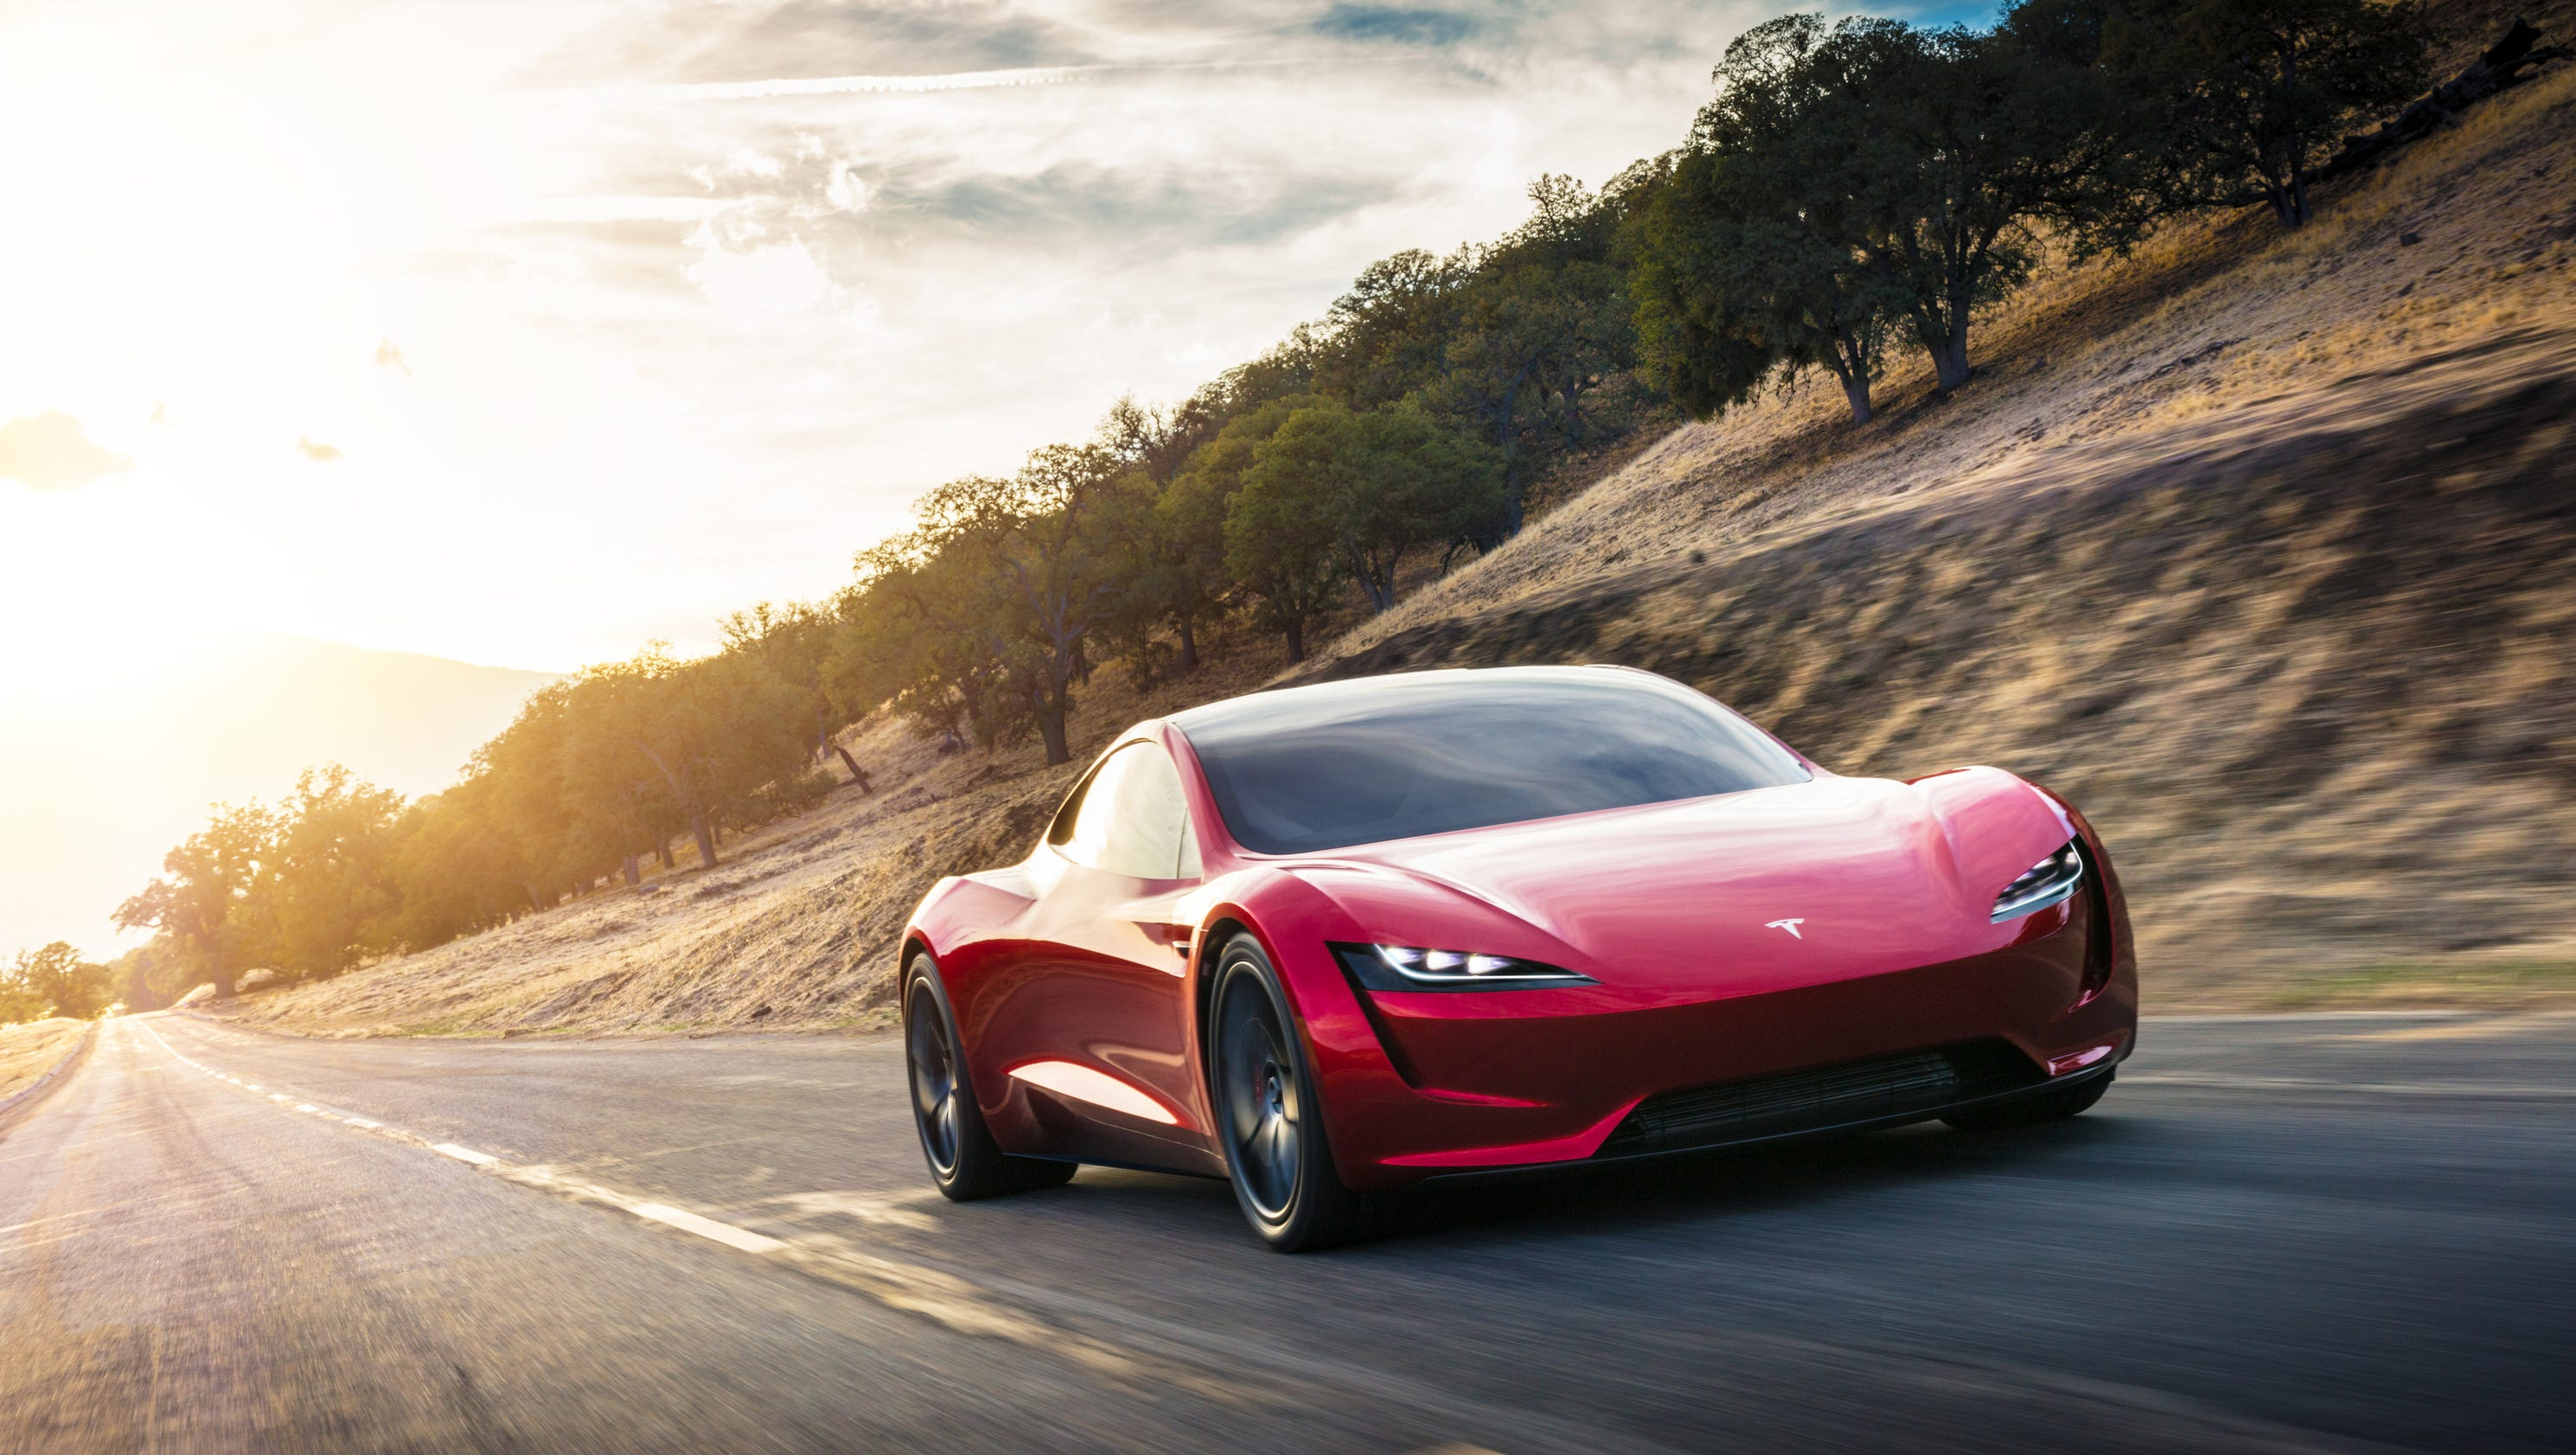 Tesla flying car? Elon Musk teases 'special upgrade' of Roadster supercar